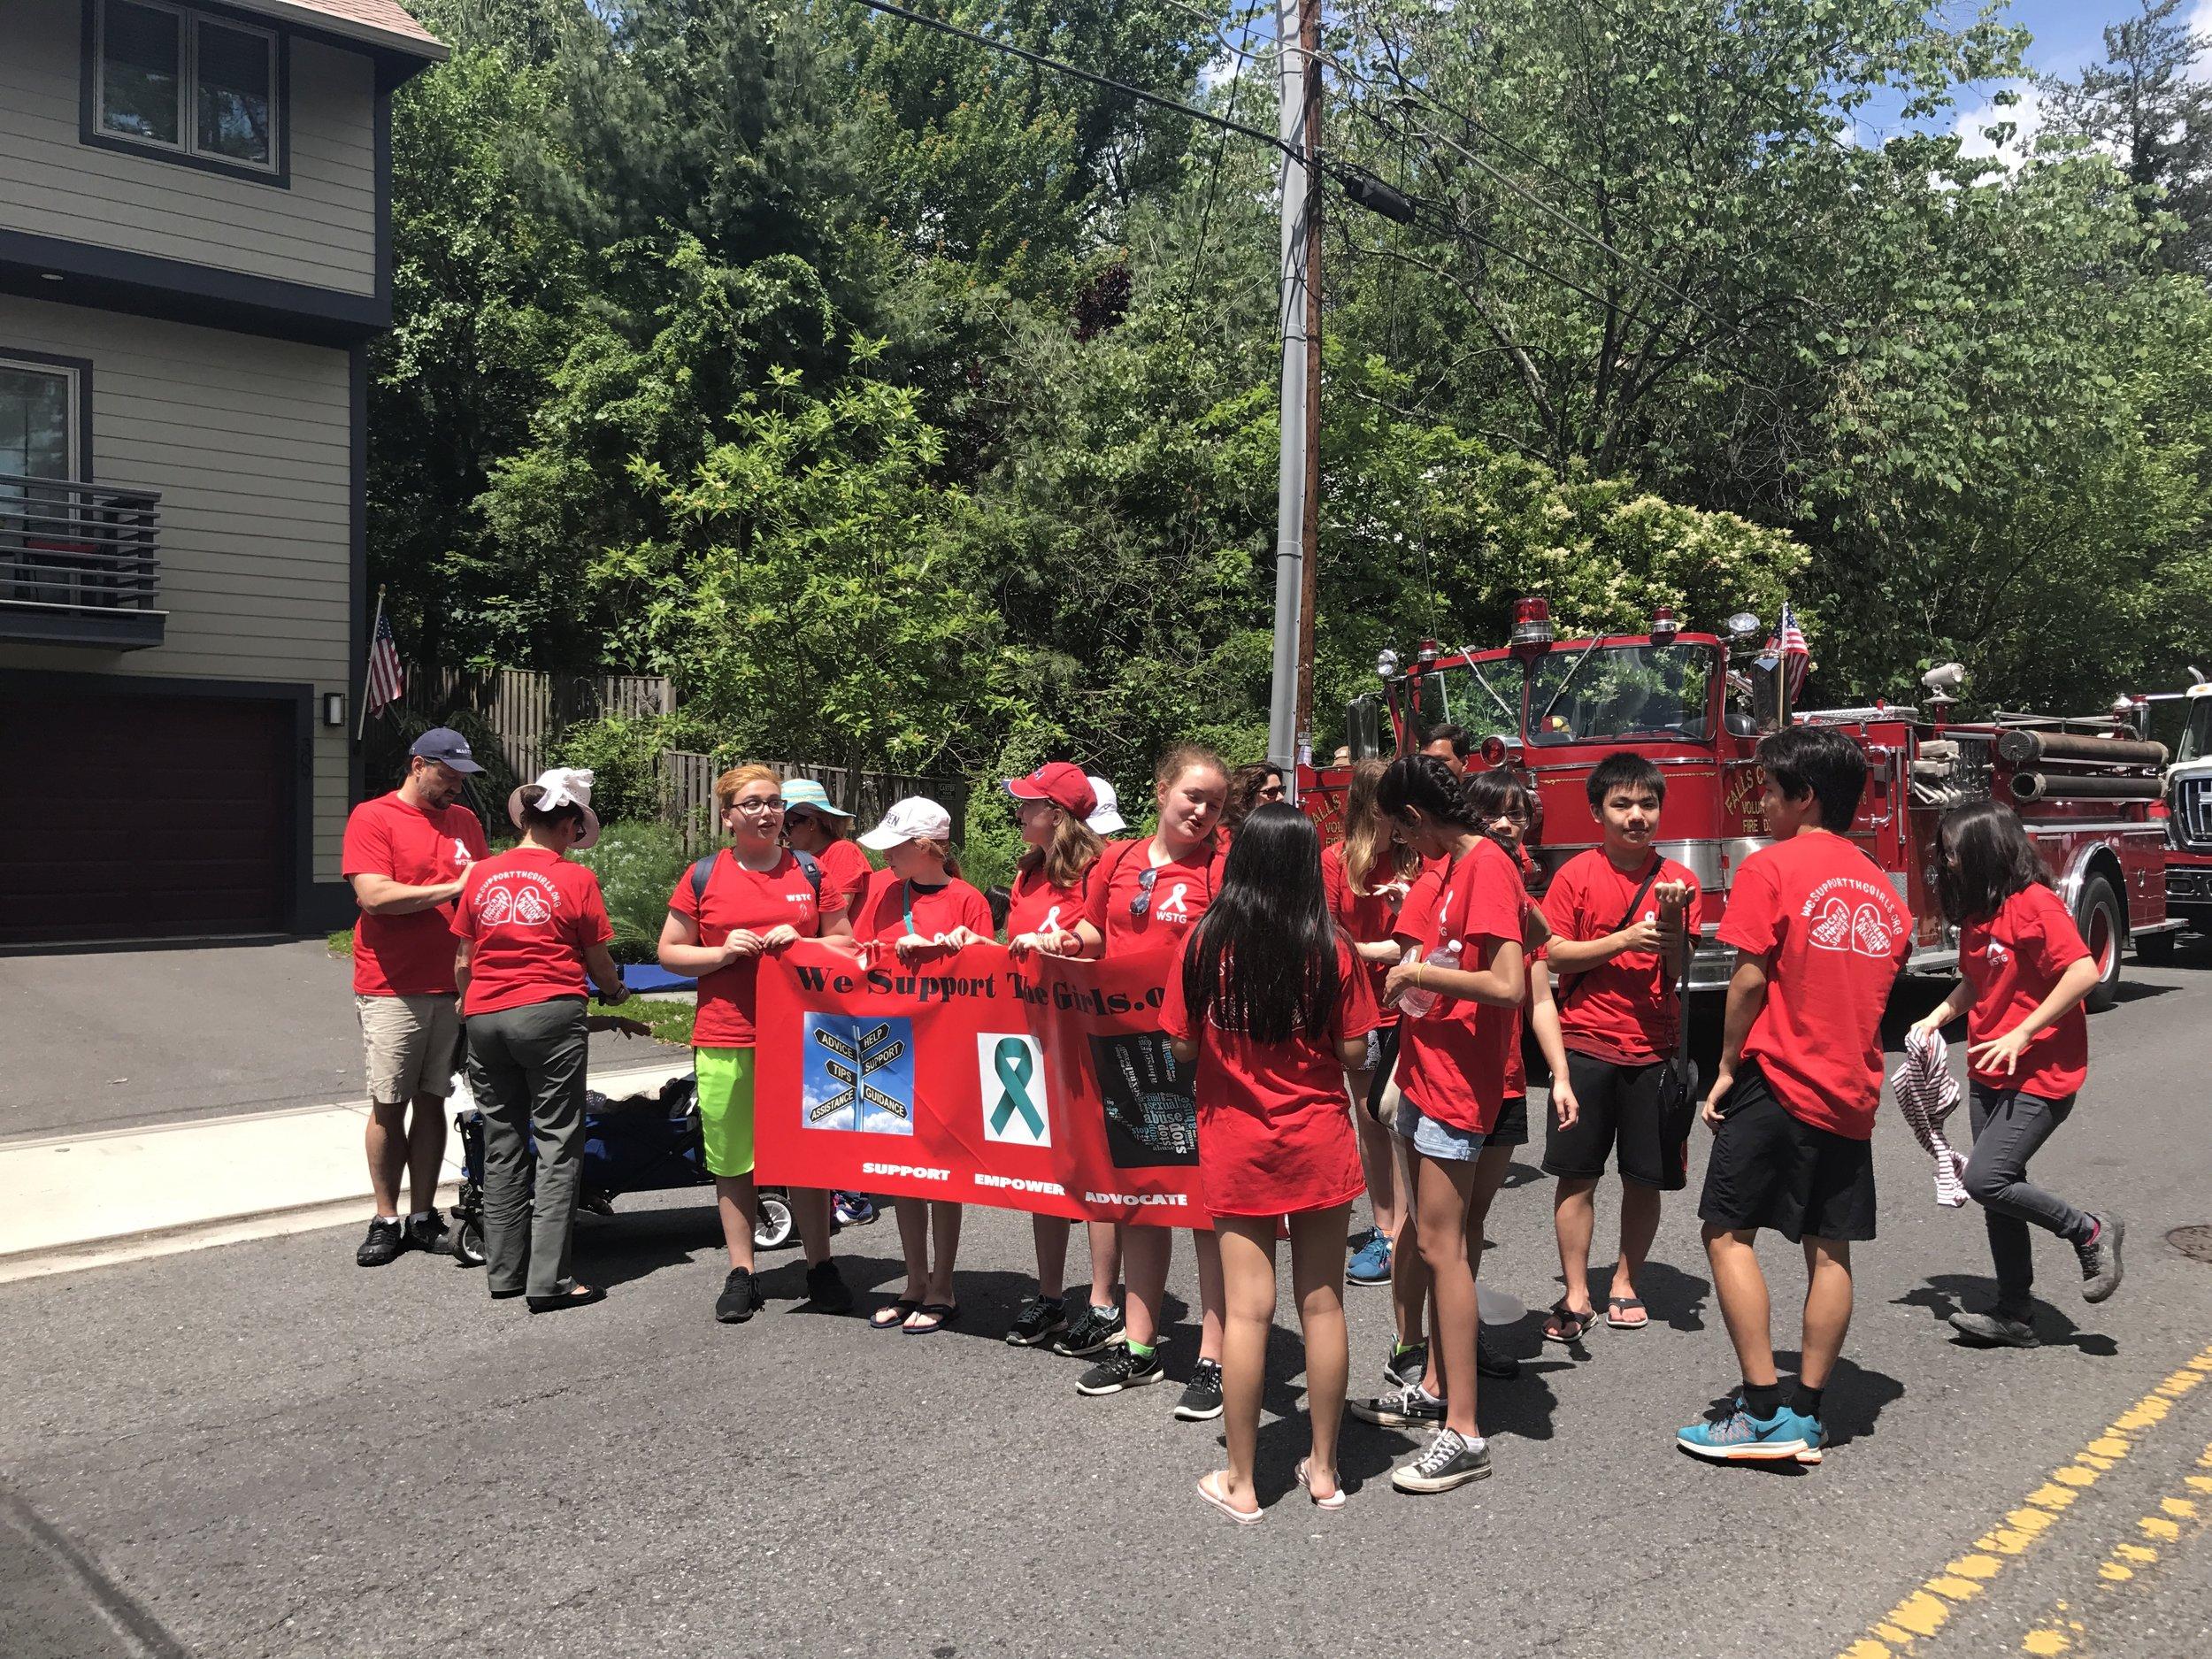 Falls Church Memorial Day Parade 2017